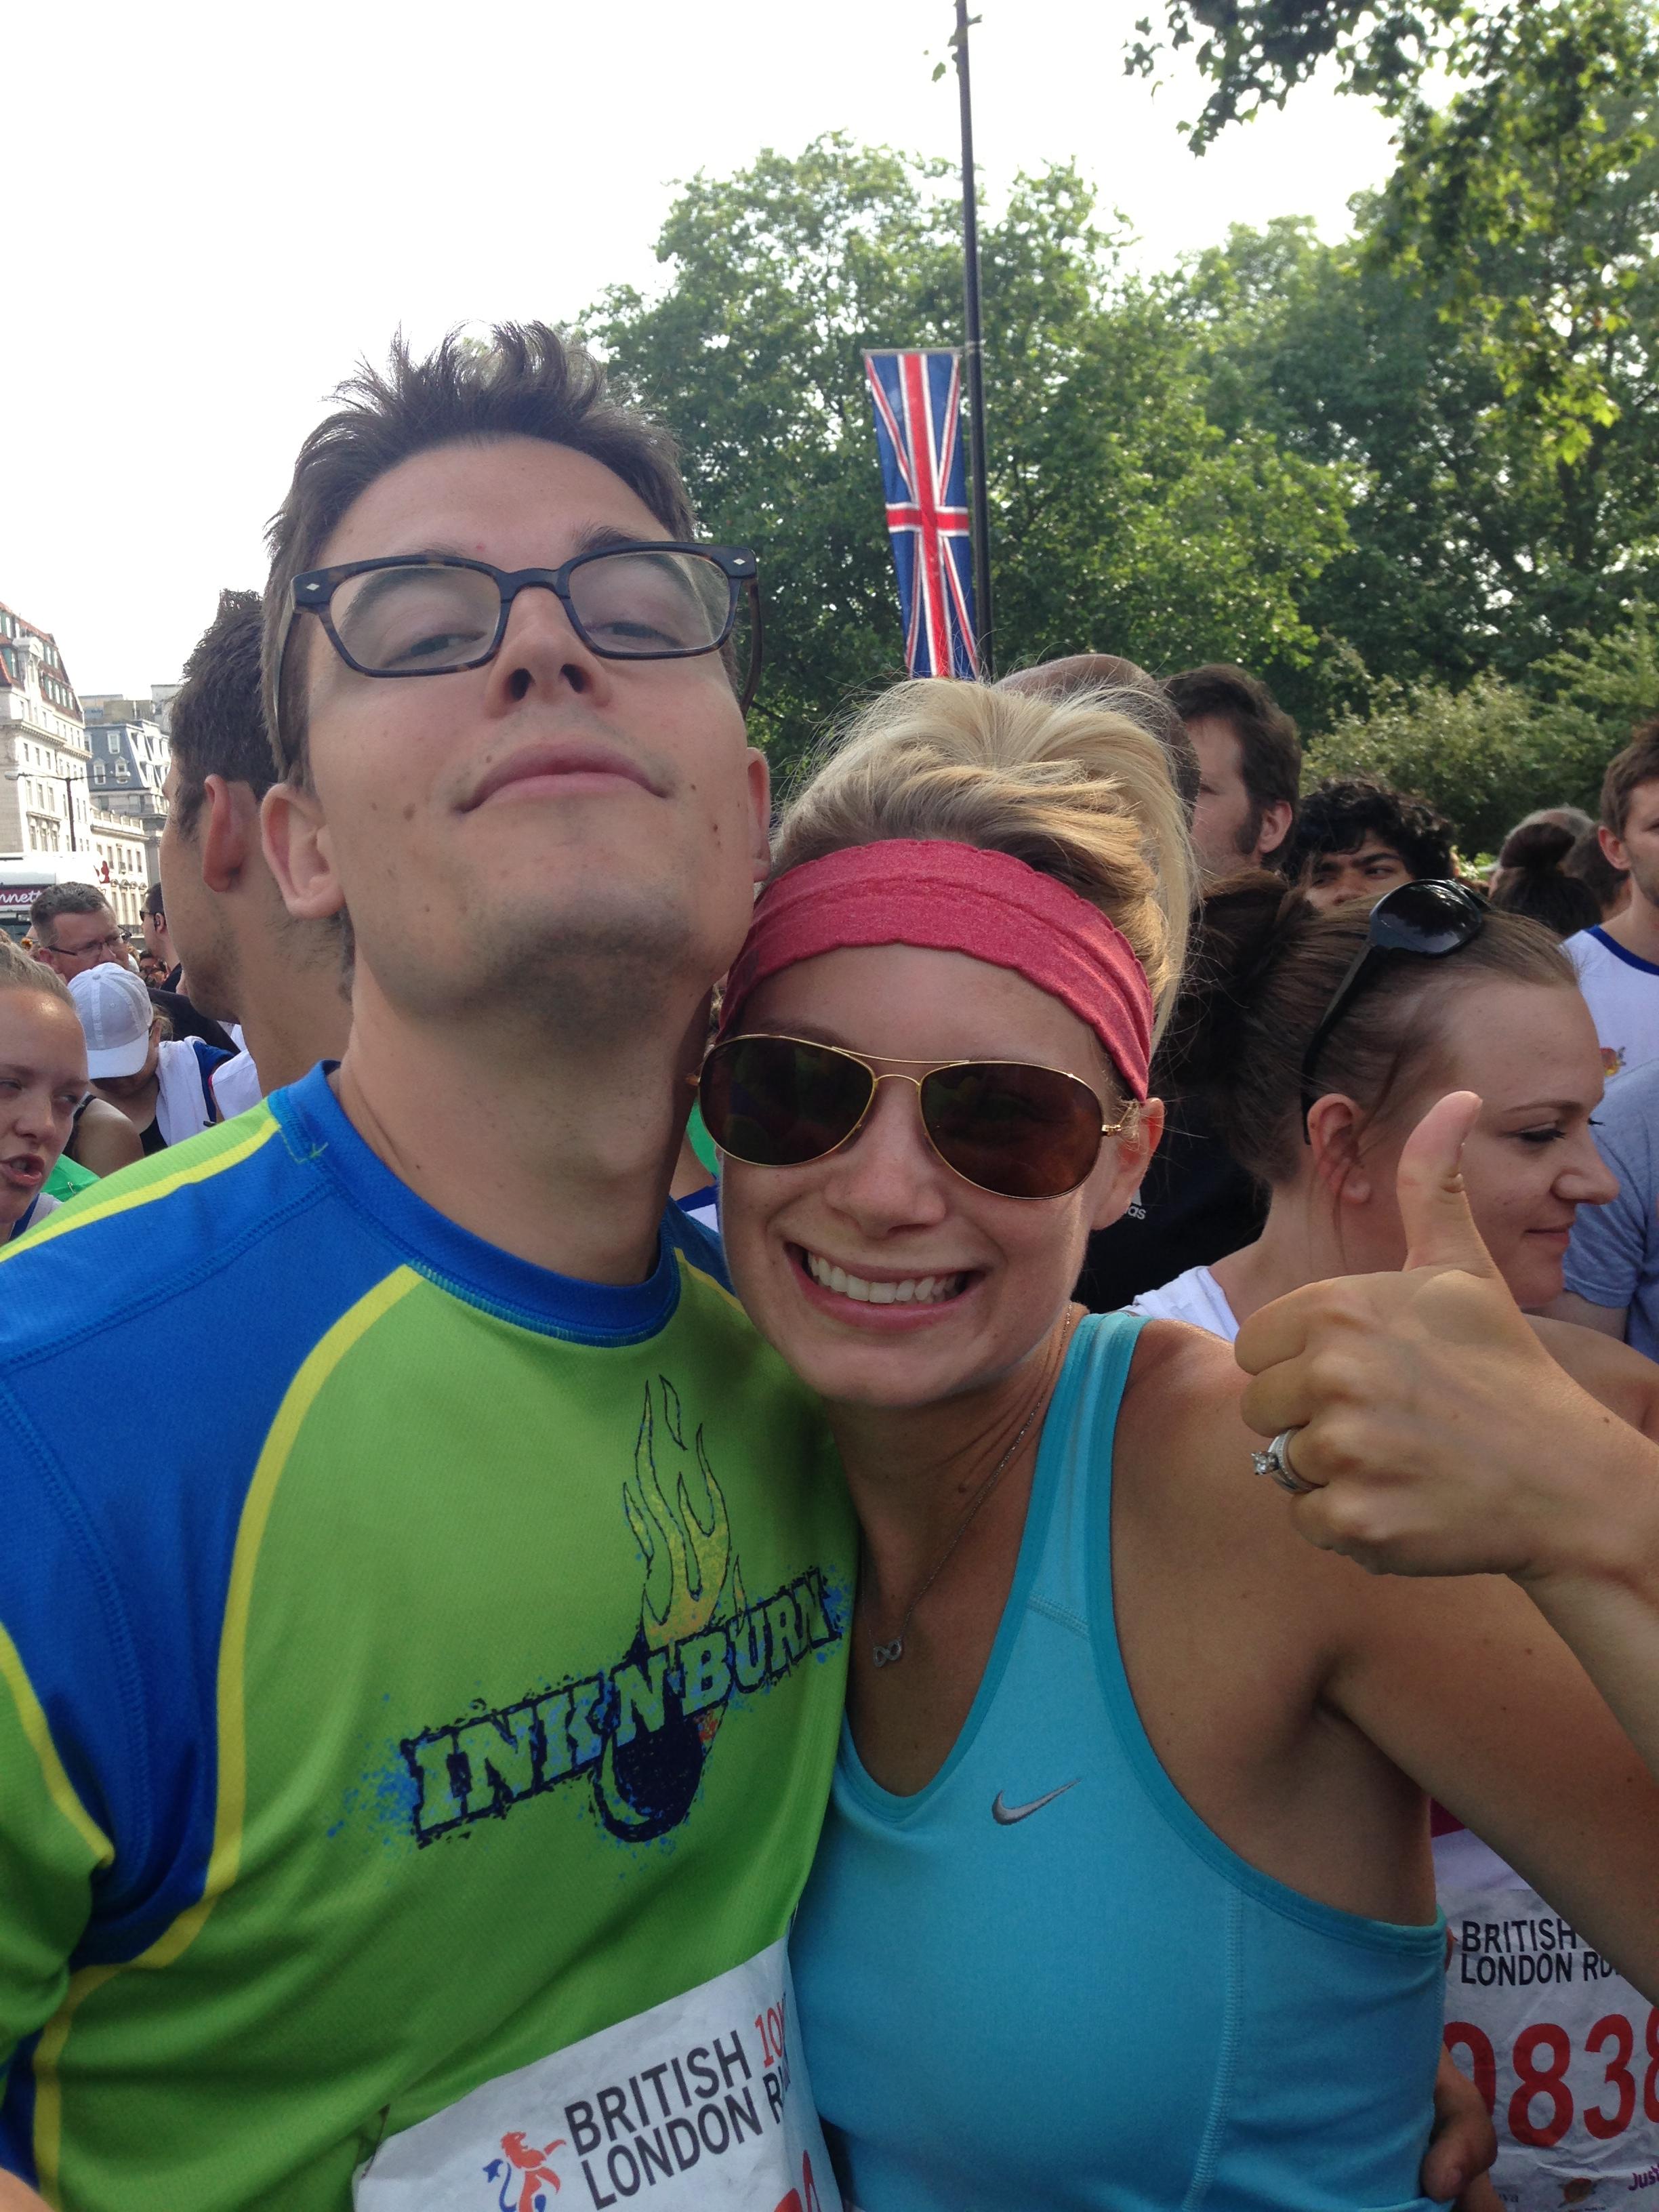 British 10K London Run 2013